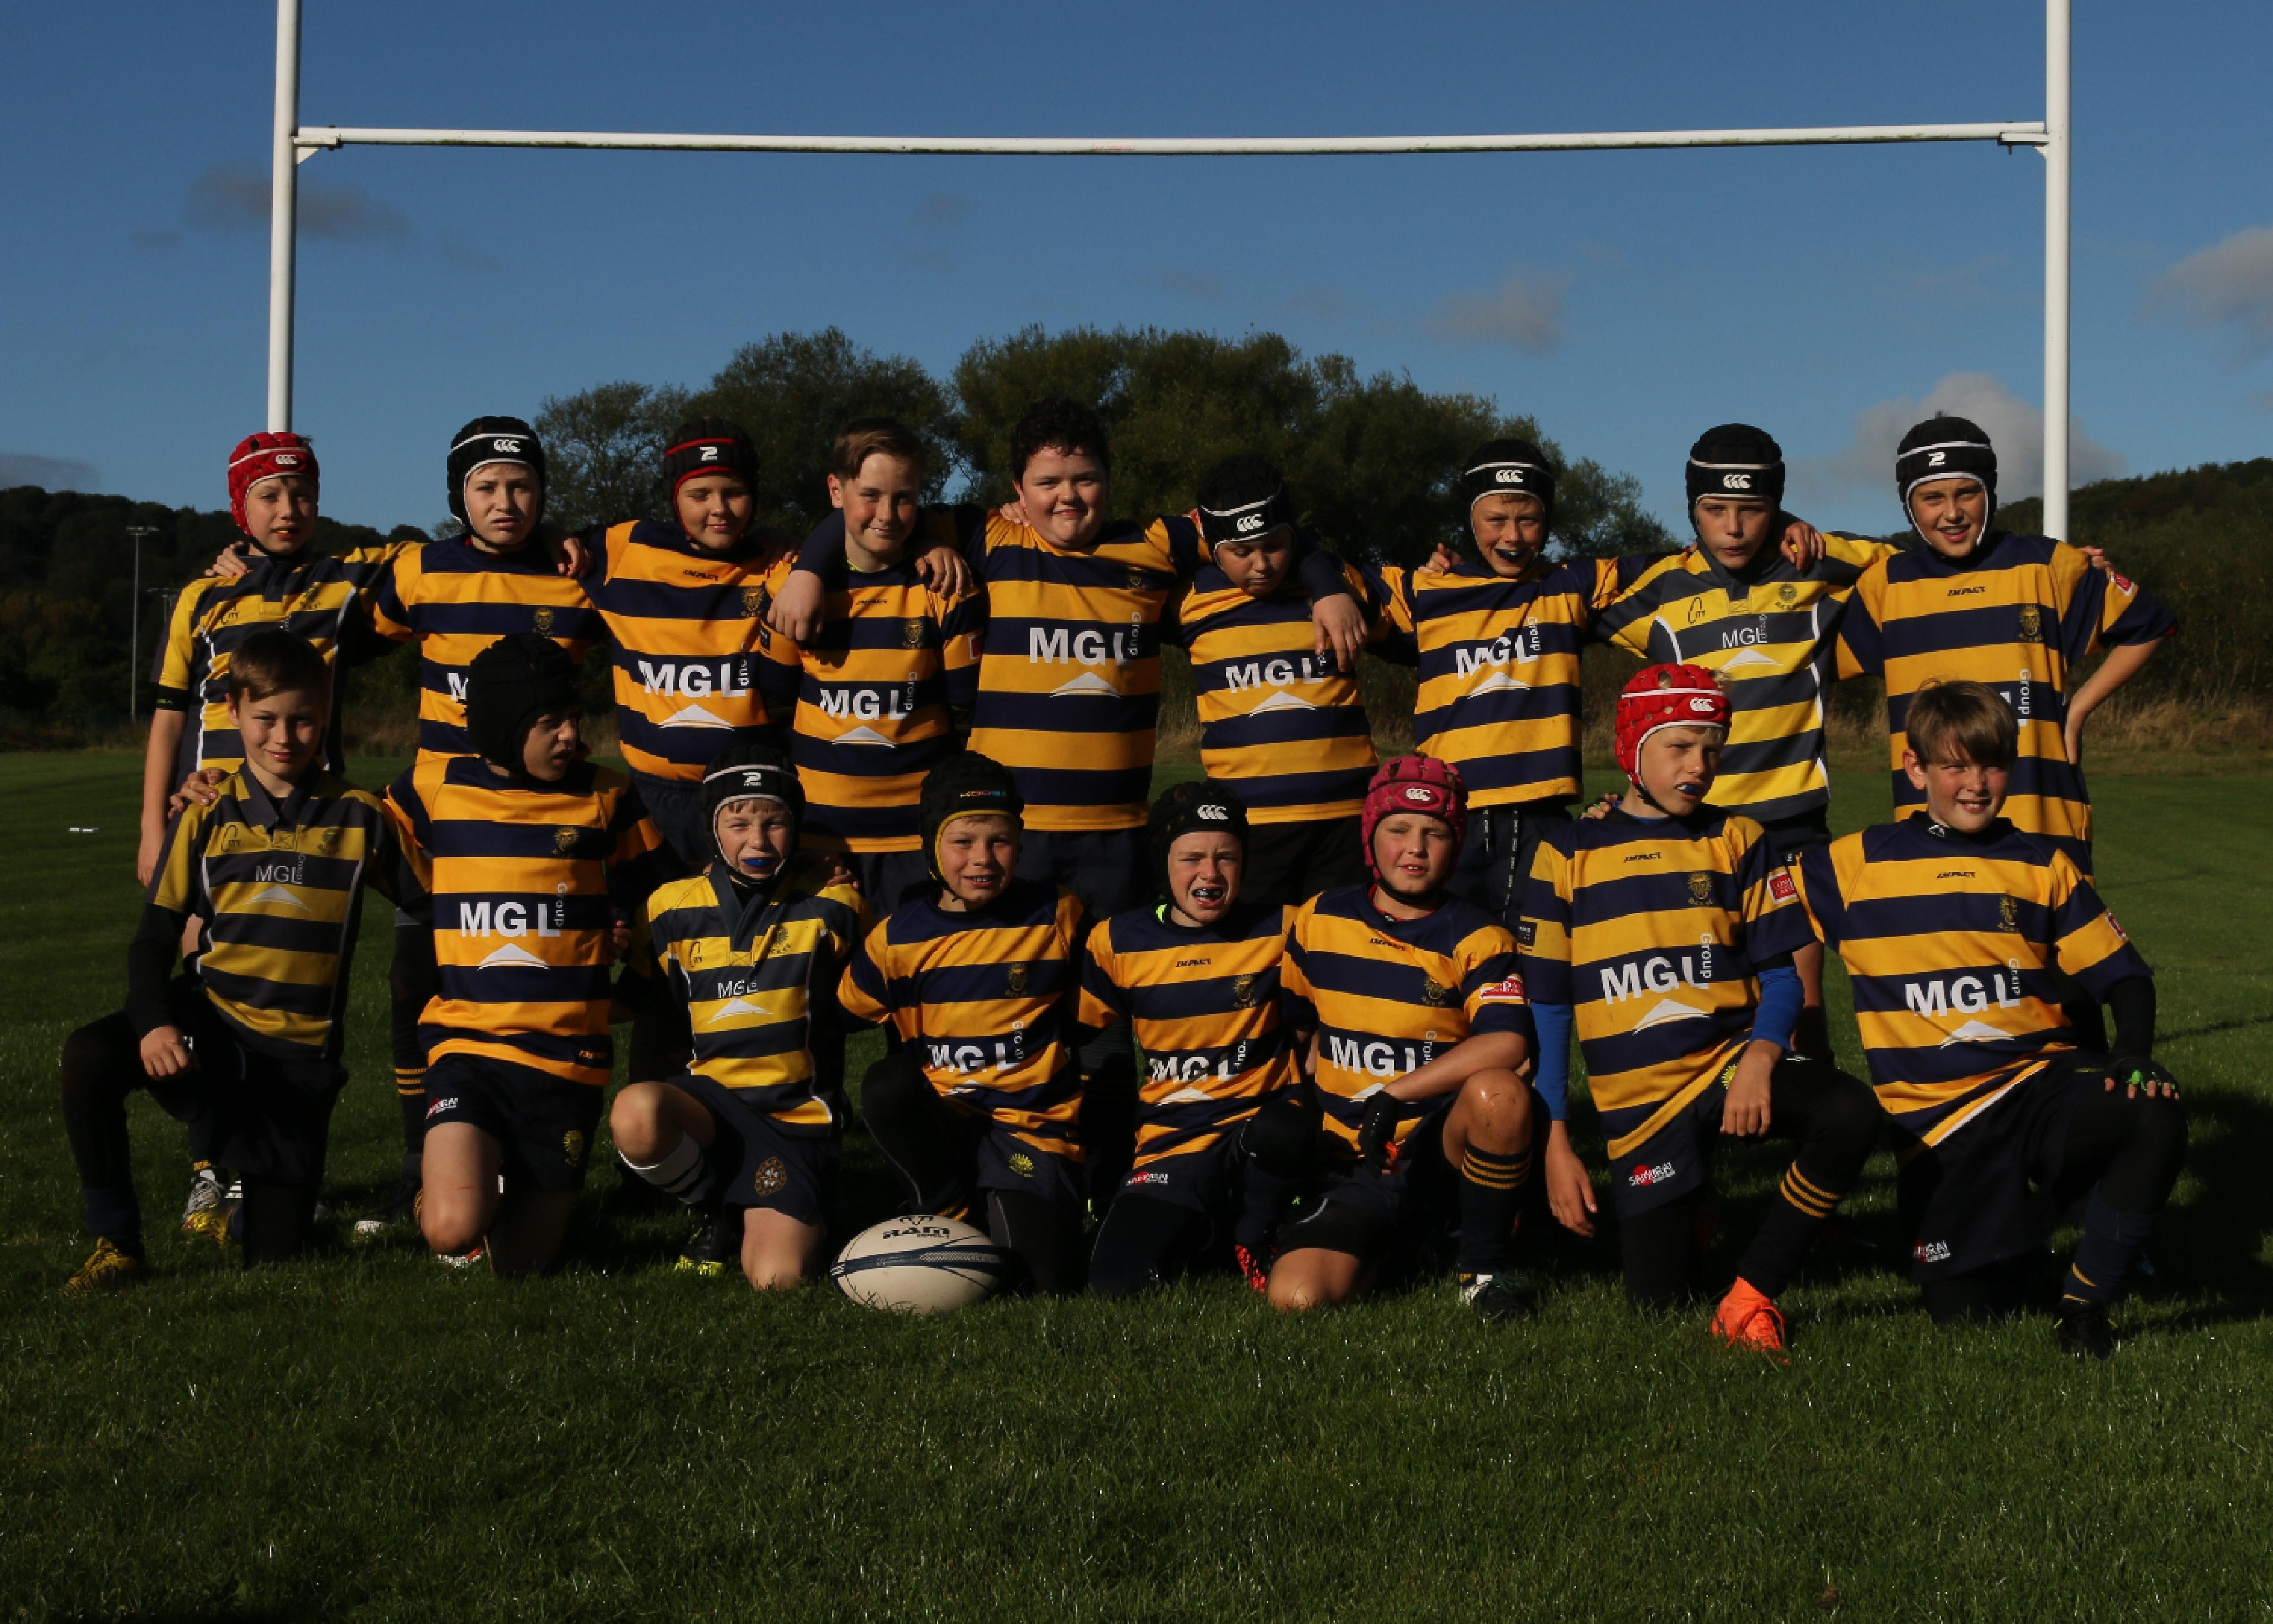 Durham City Rugby Football Club Vs Durham City Rugby Football Club